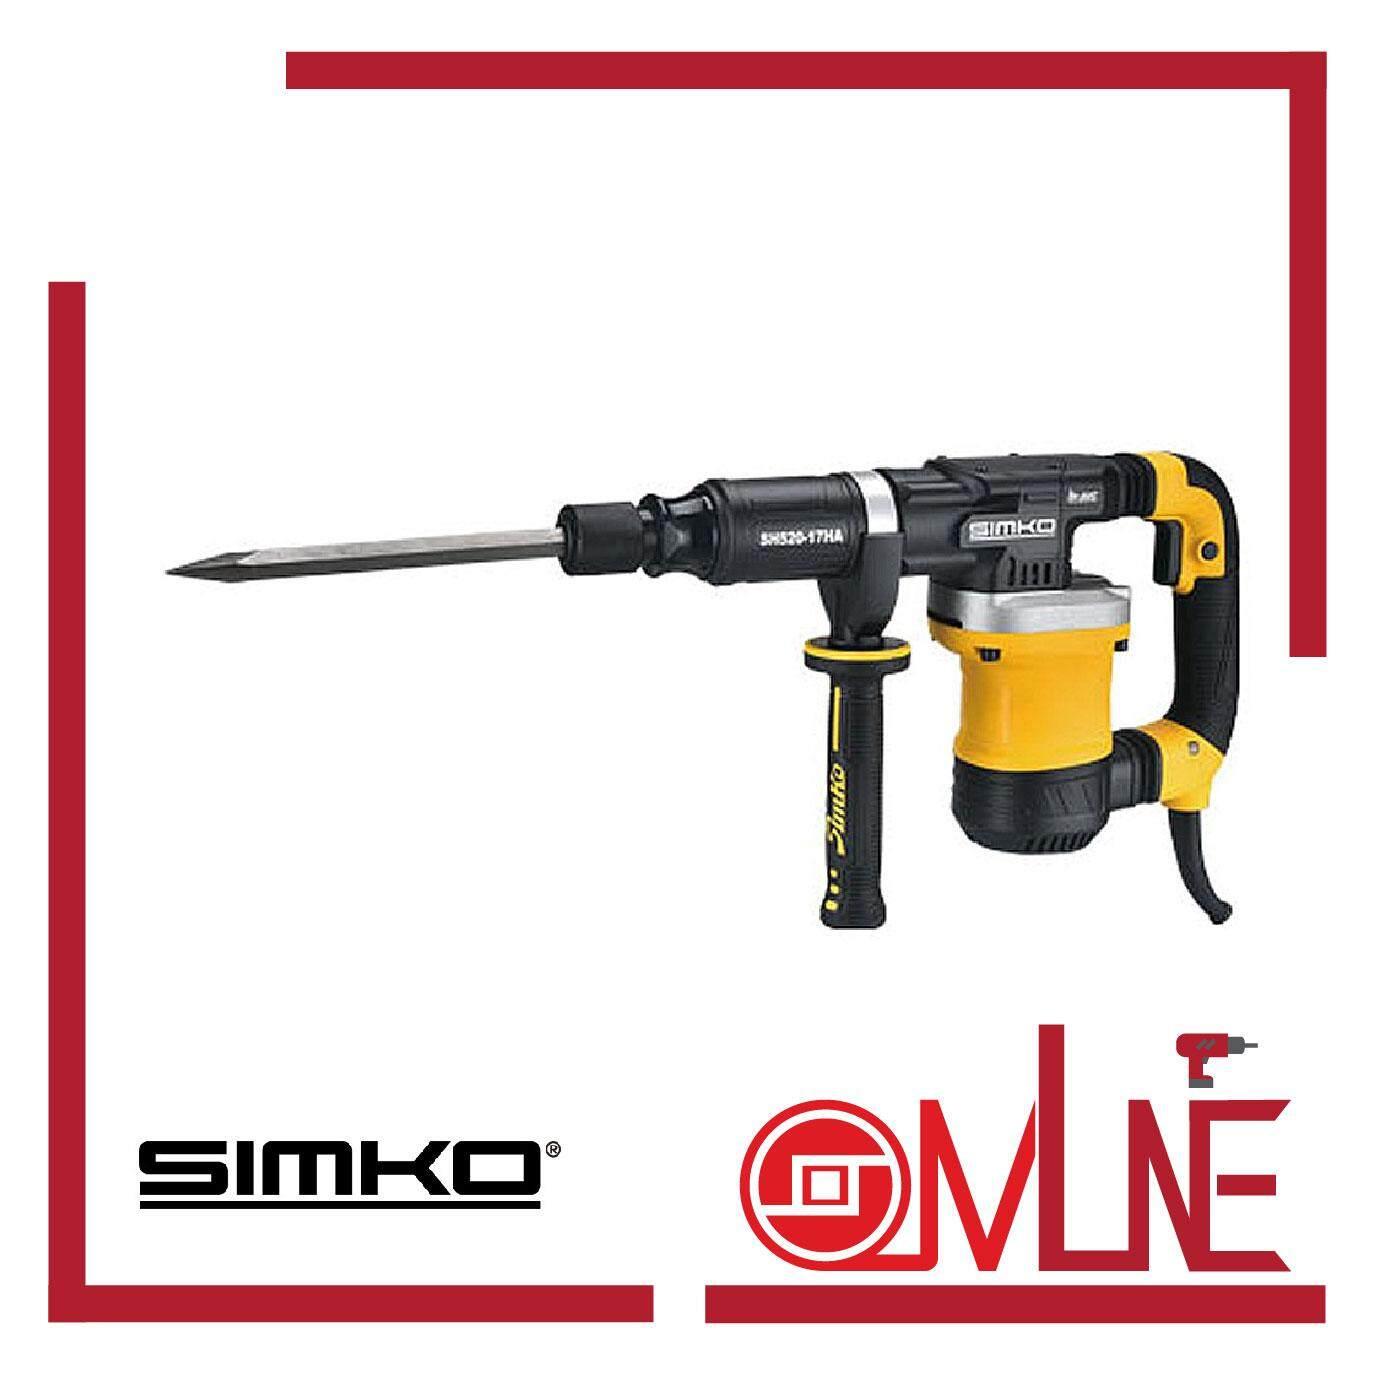 SIMKO SH520-17HA Demolition Hammer [HEAVY DUTY]